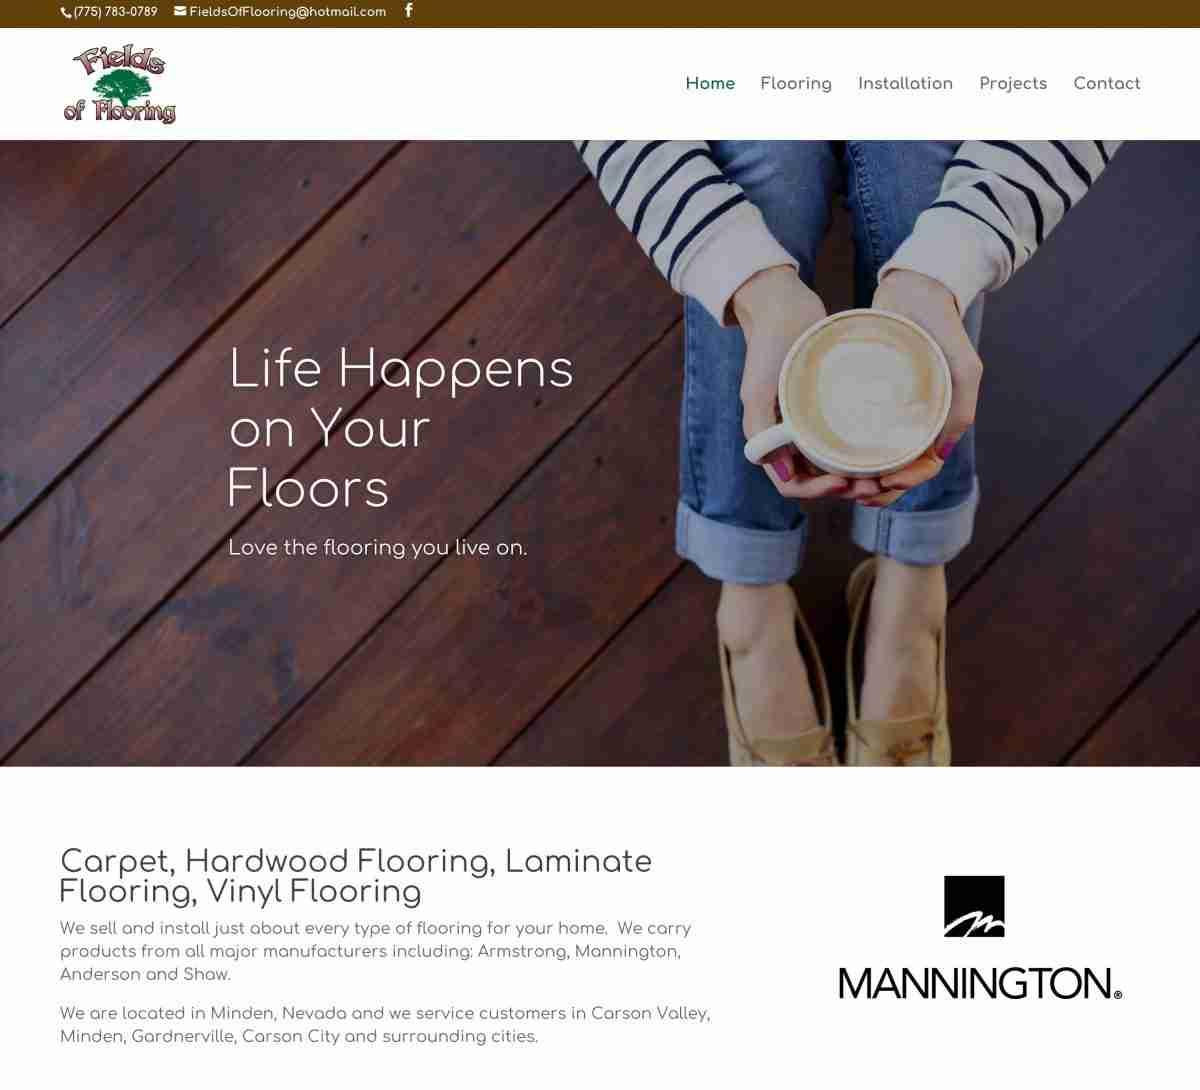 Carpet, Hardwood Flooring, Laminate Flooring, Vinyl Flooring - Fields of Flooring